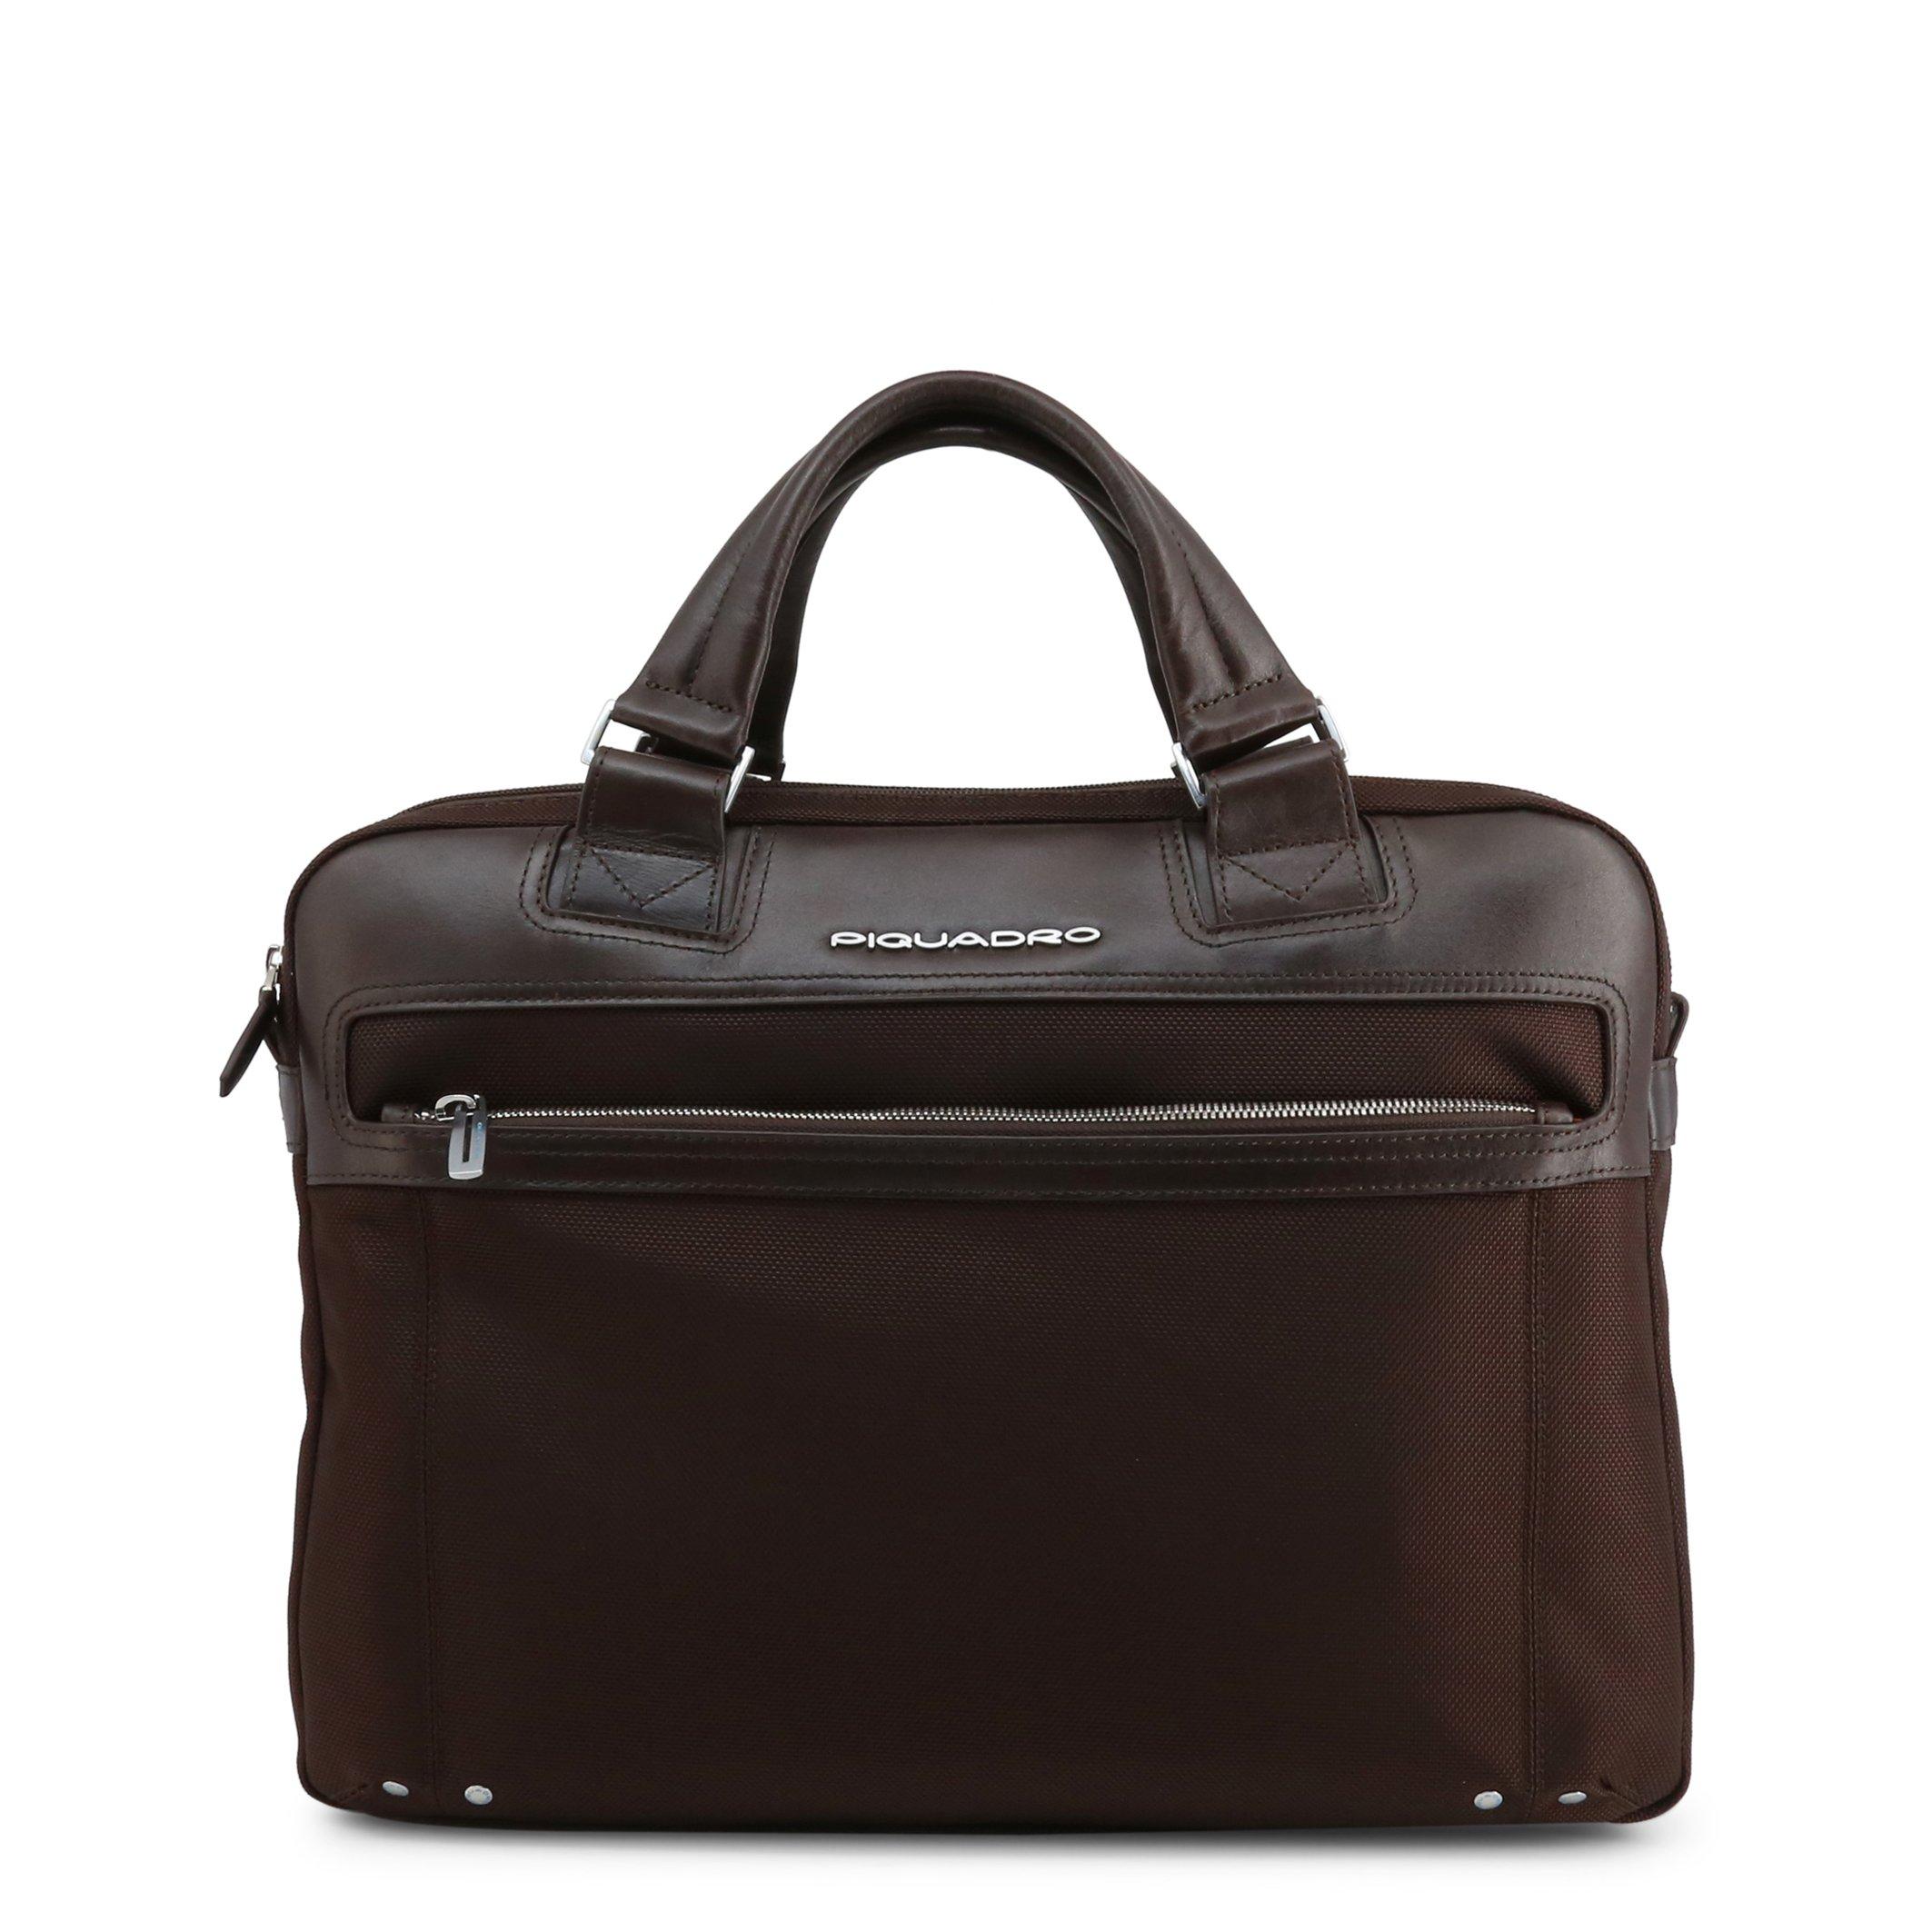 Piquadro Men's Briefcase Various Colours CA3339LK2 - brown NOSIZE